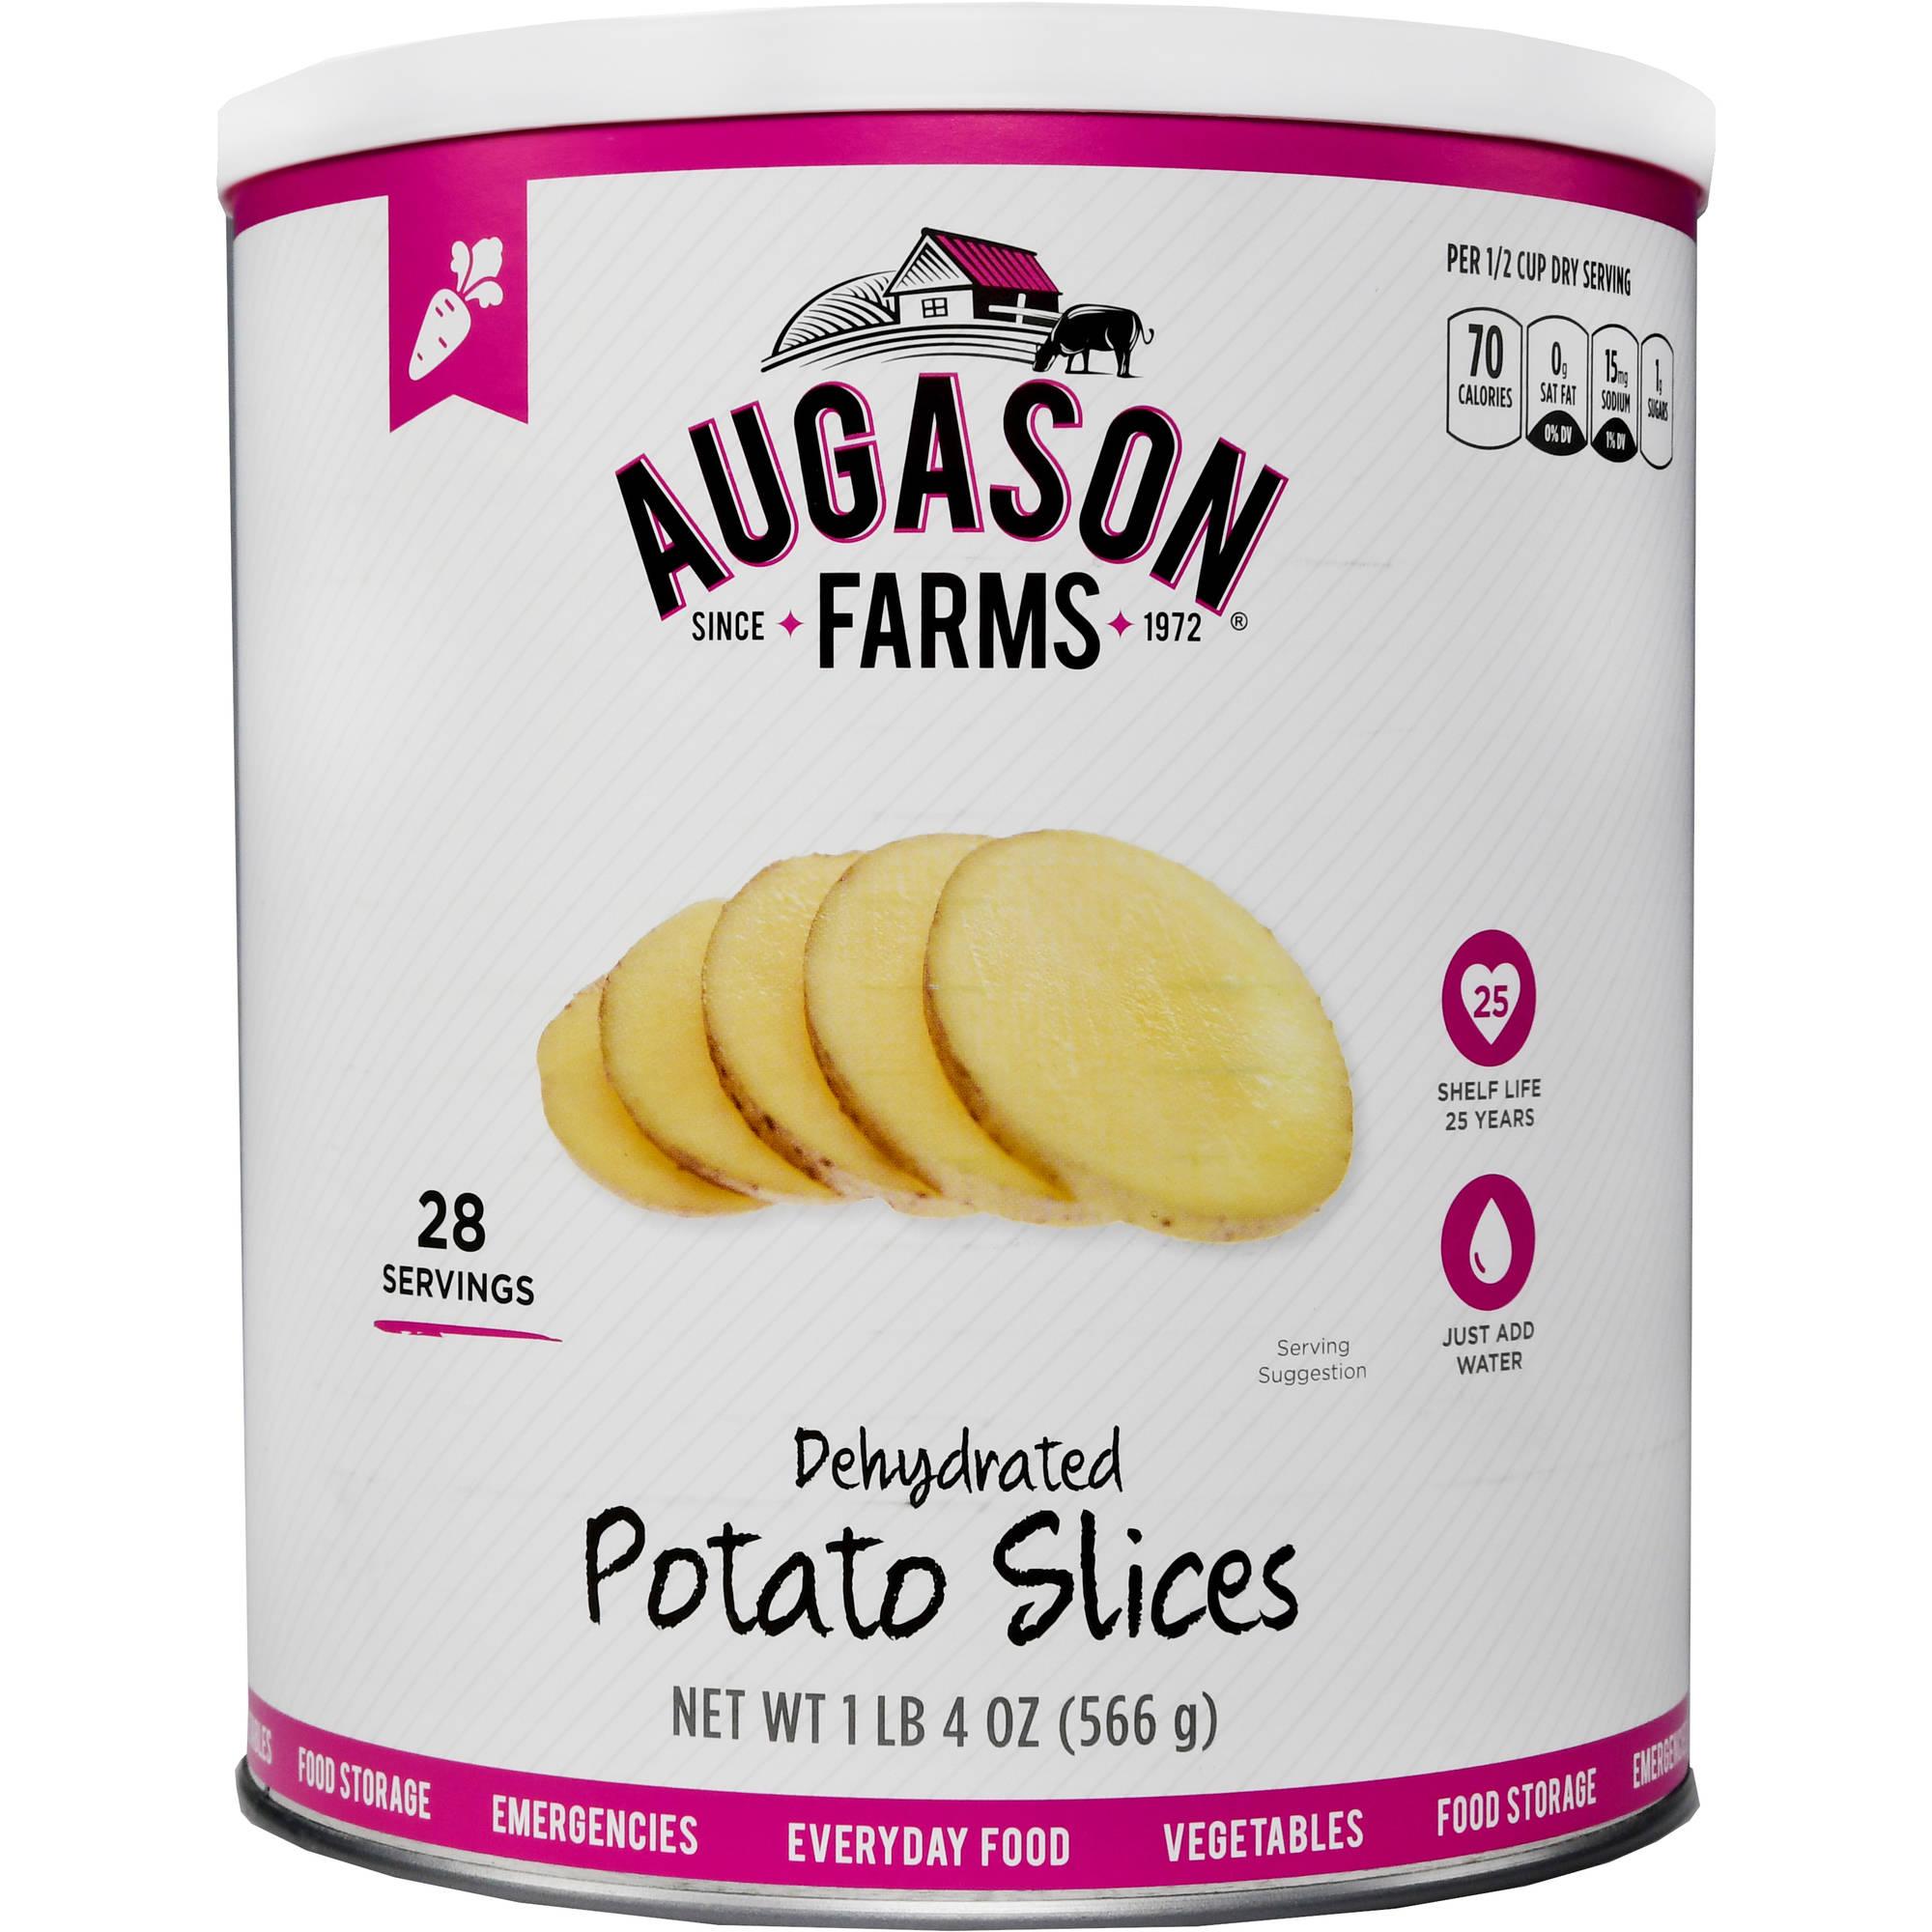 Augason Farms Emergency Food Dehydrated Potato Slices, 20 oz